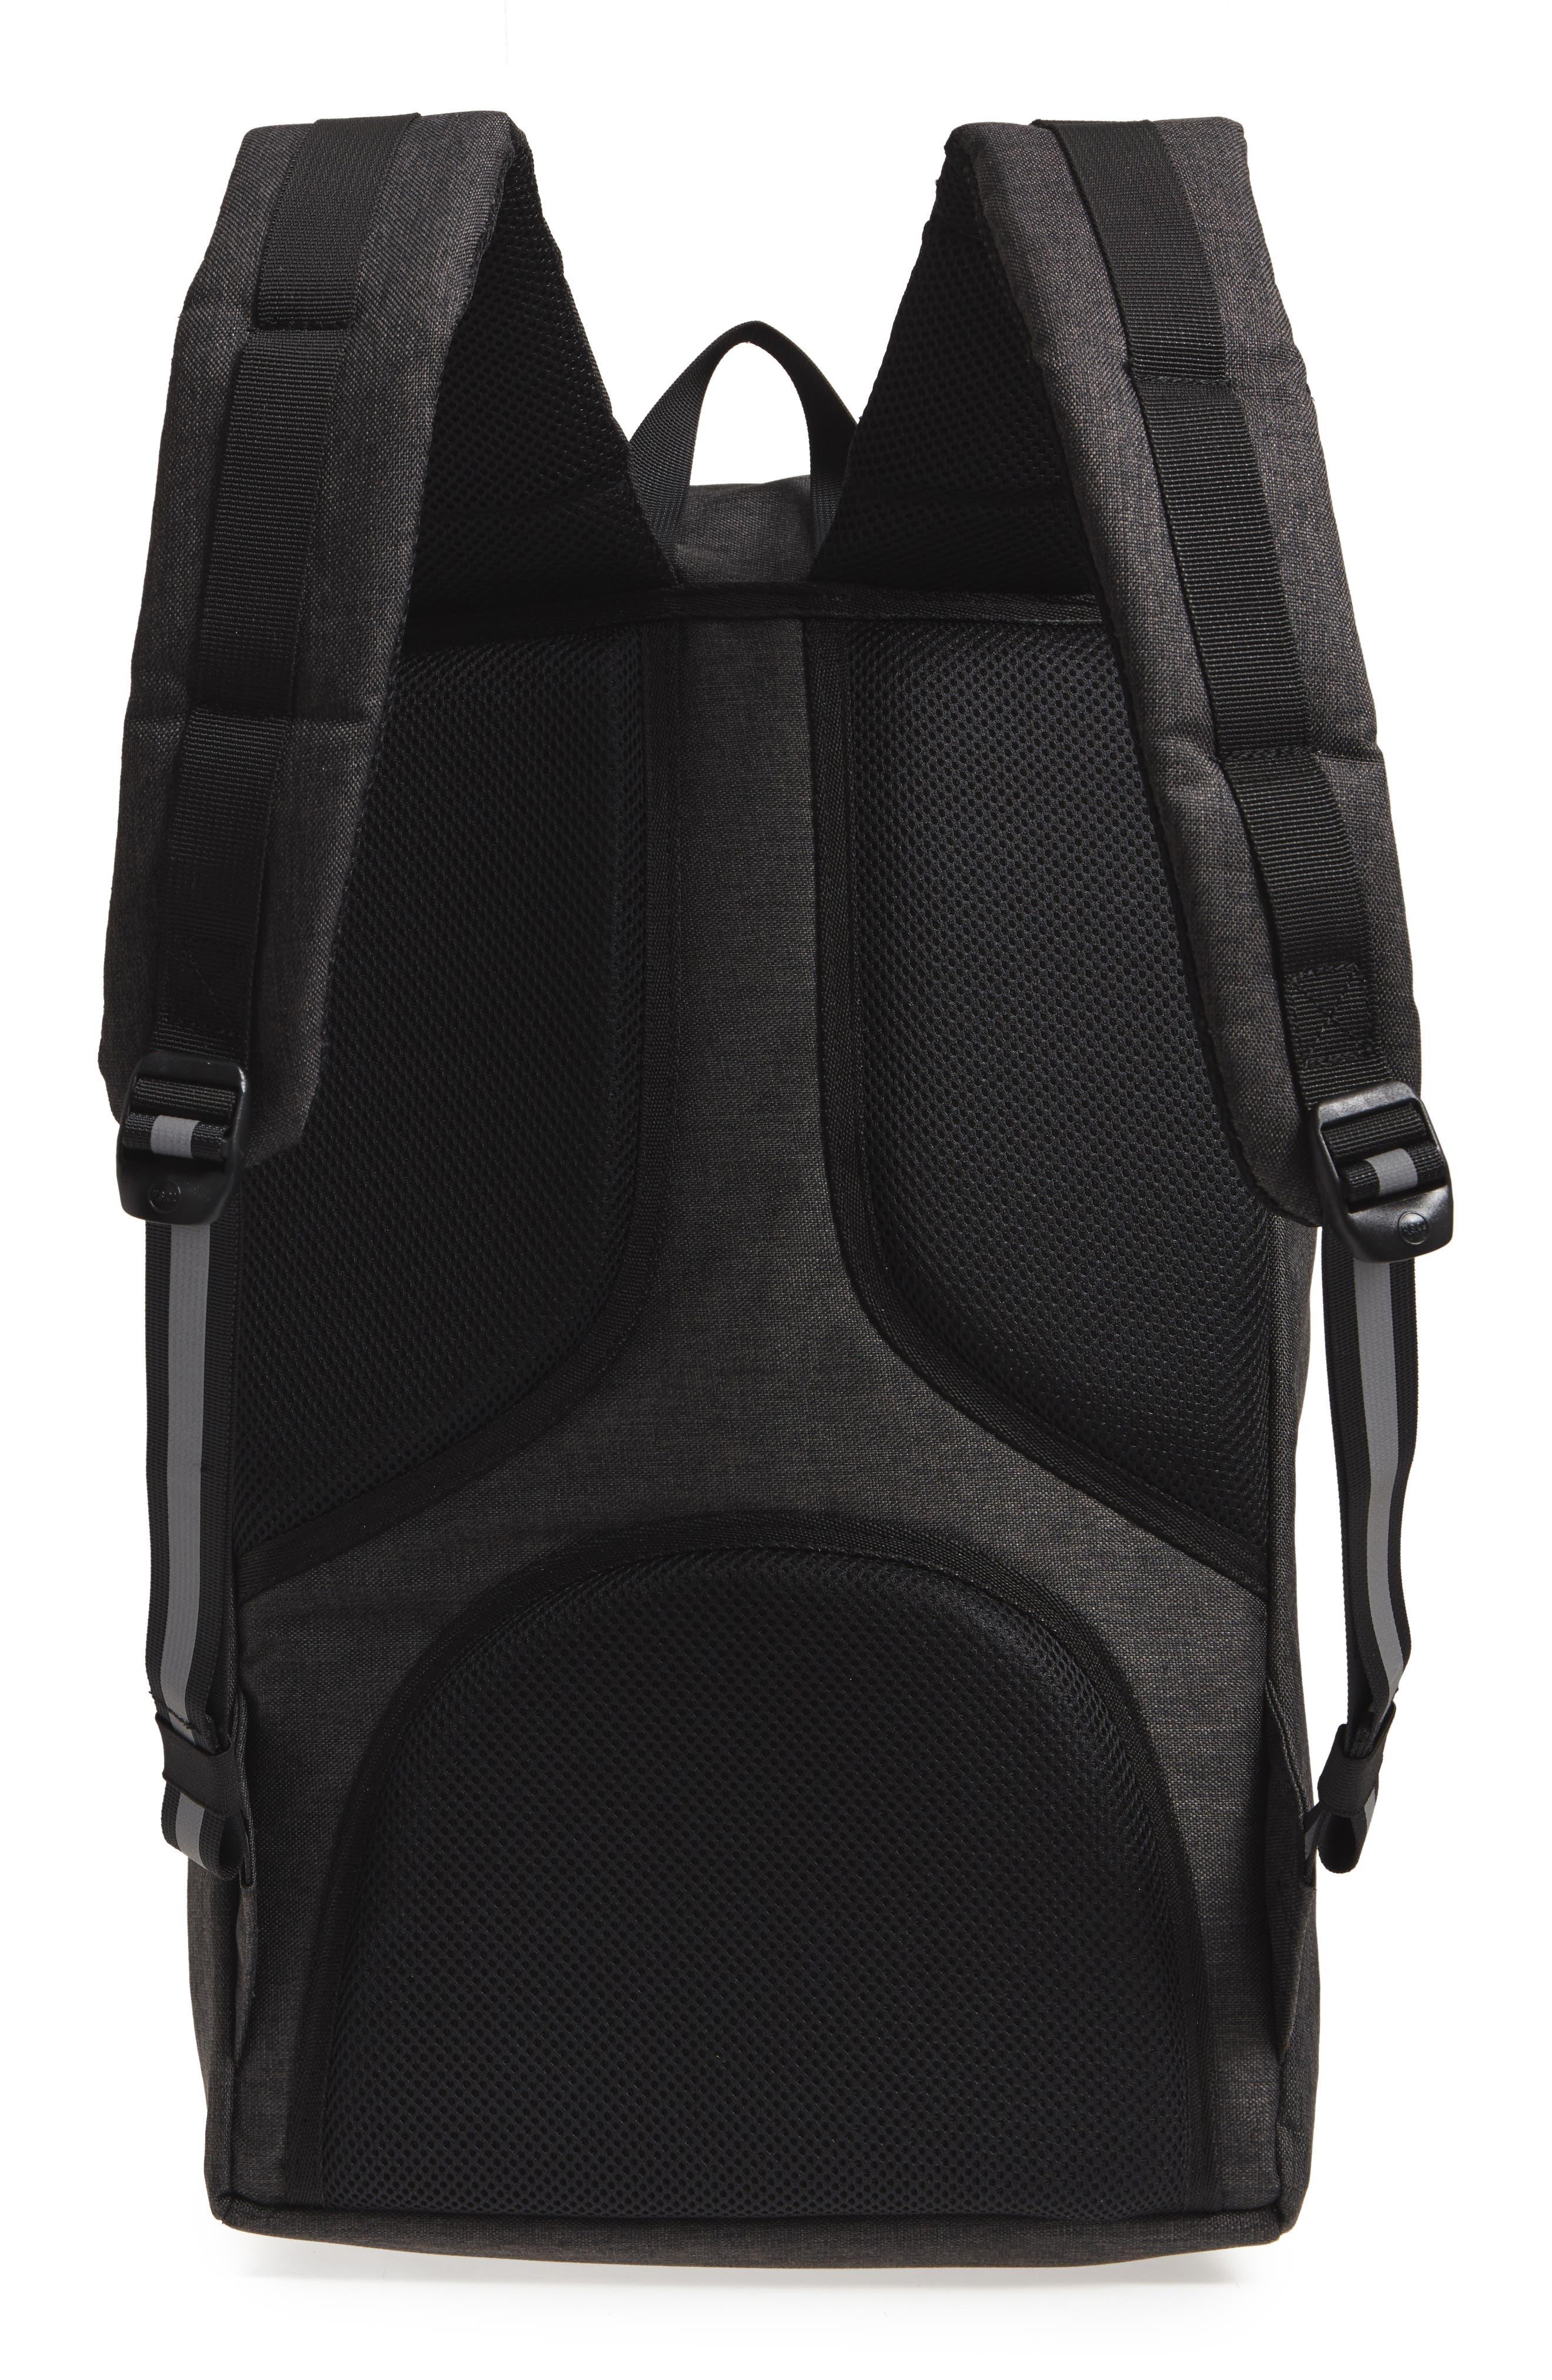 Little America - Reflective Backpack,                             Alternate thumbnail 3, color,                             Black Crosshatch/ Reflective